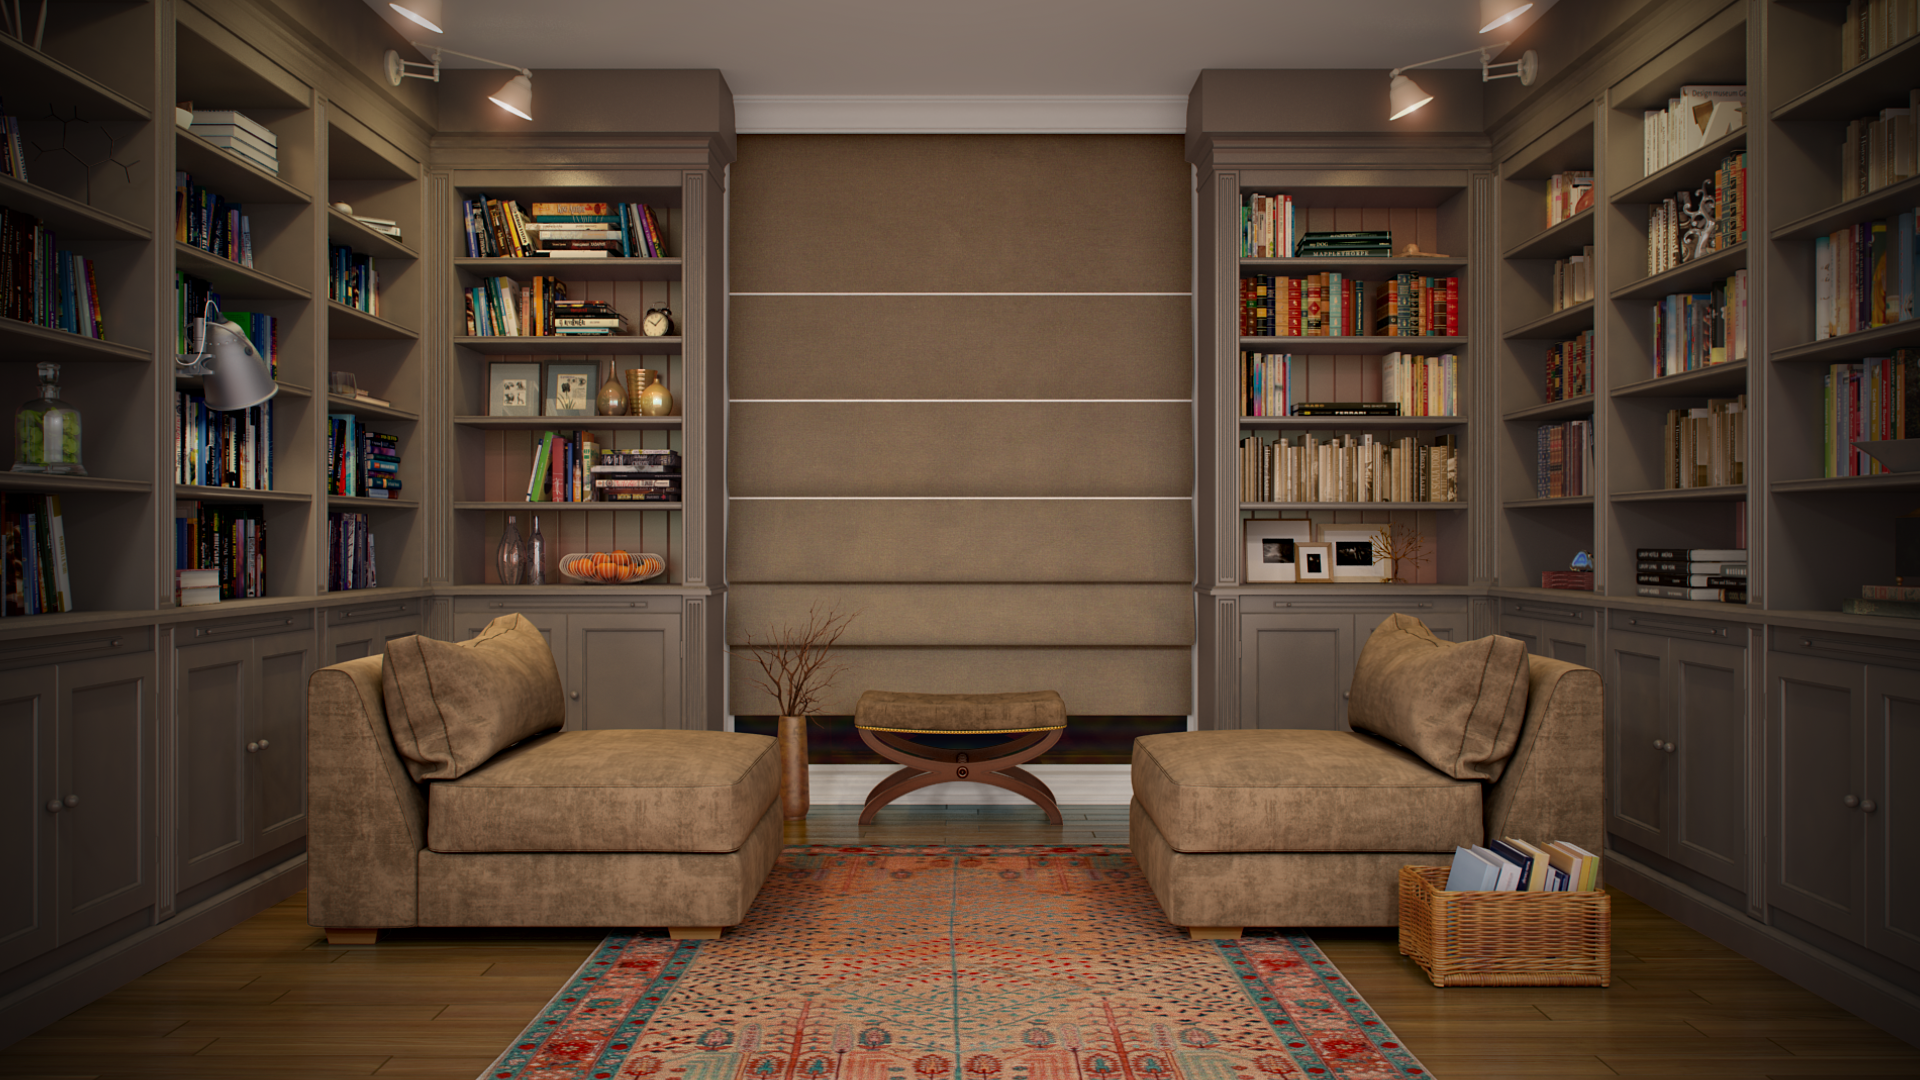 Library Interior Design Ideas photo - 8